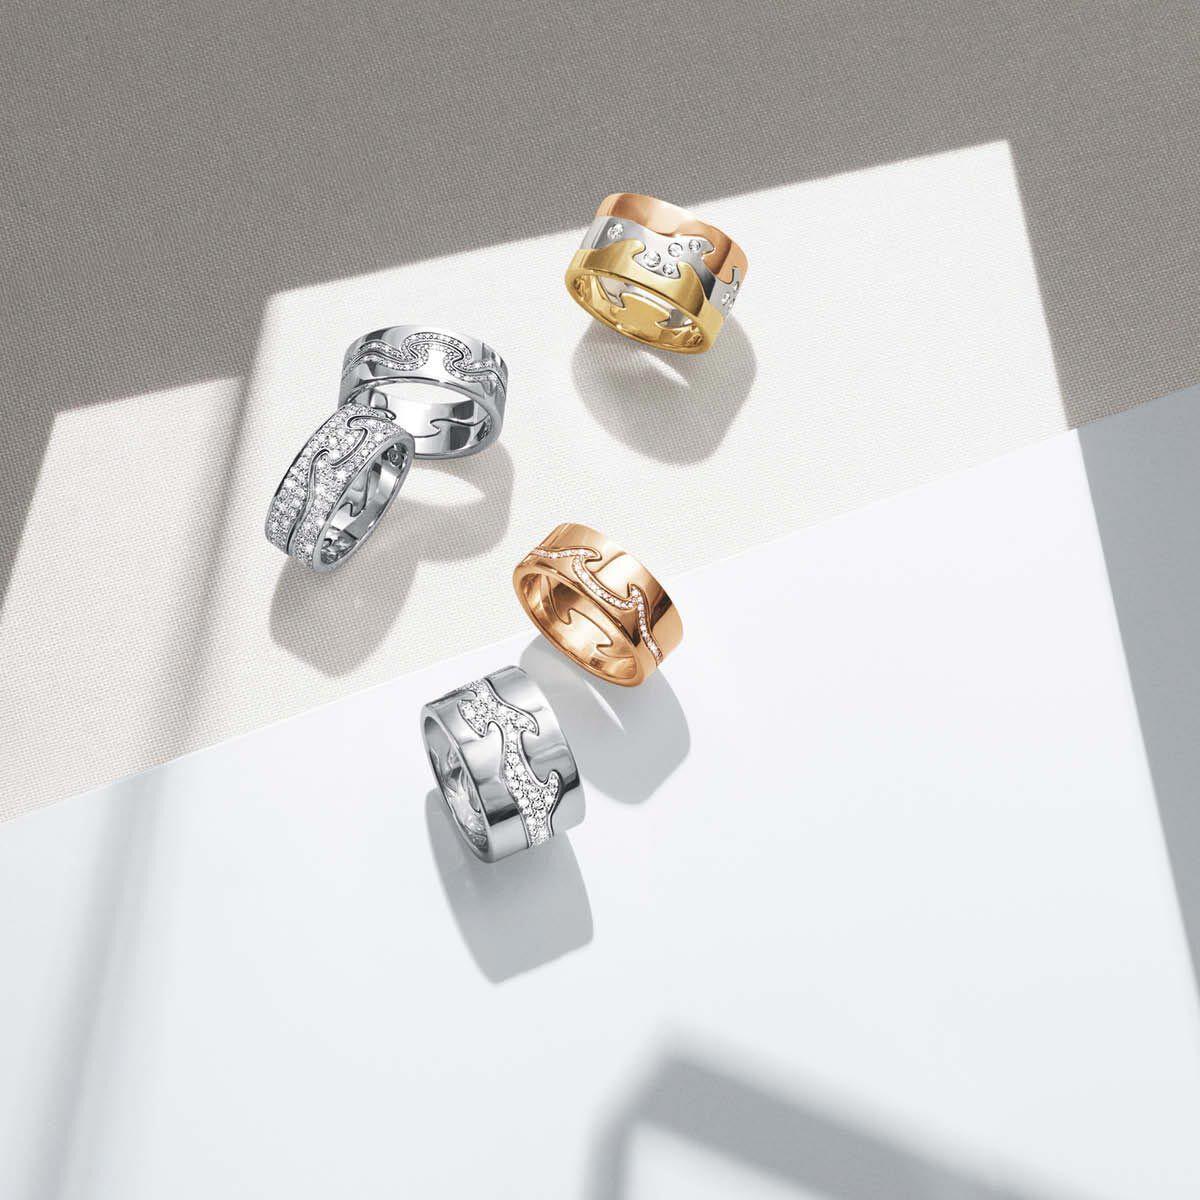 FUSION フュージョン ピアス 18Kホワイトゴールド+ パヴェダイヤモンド